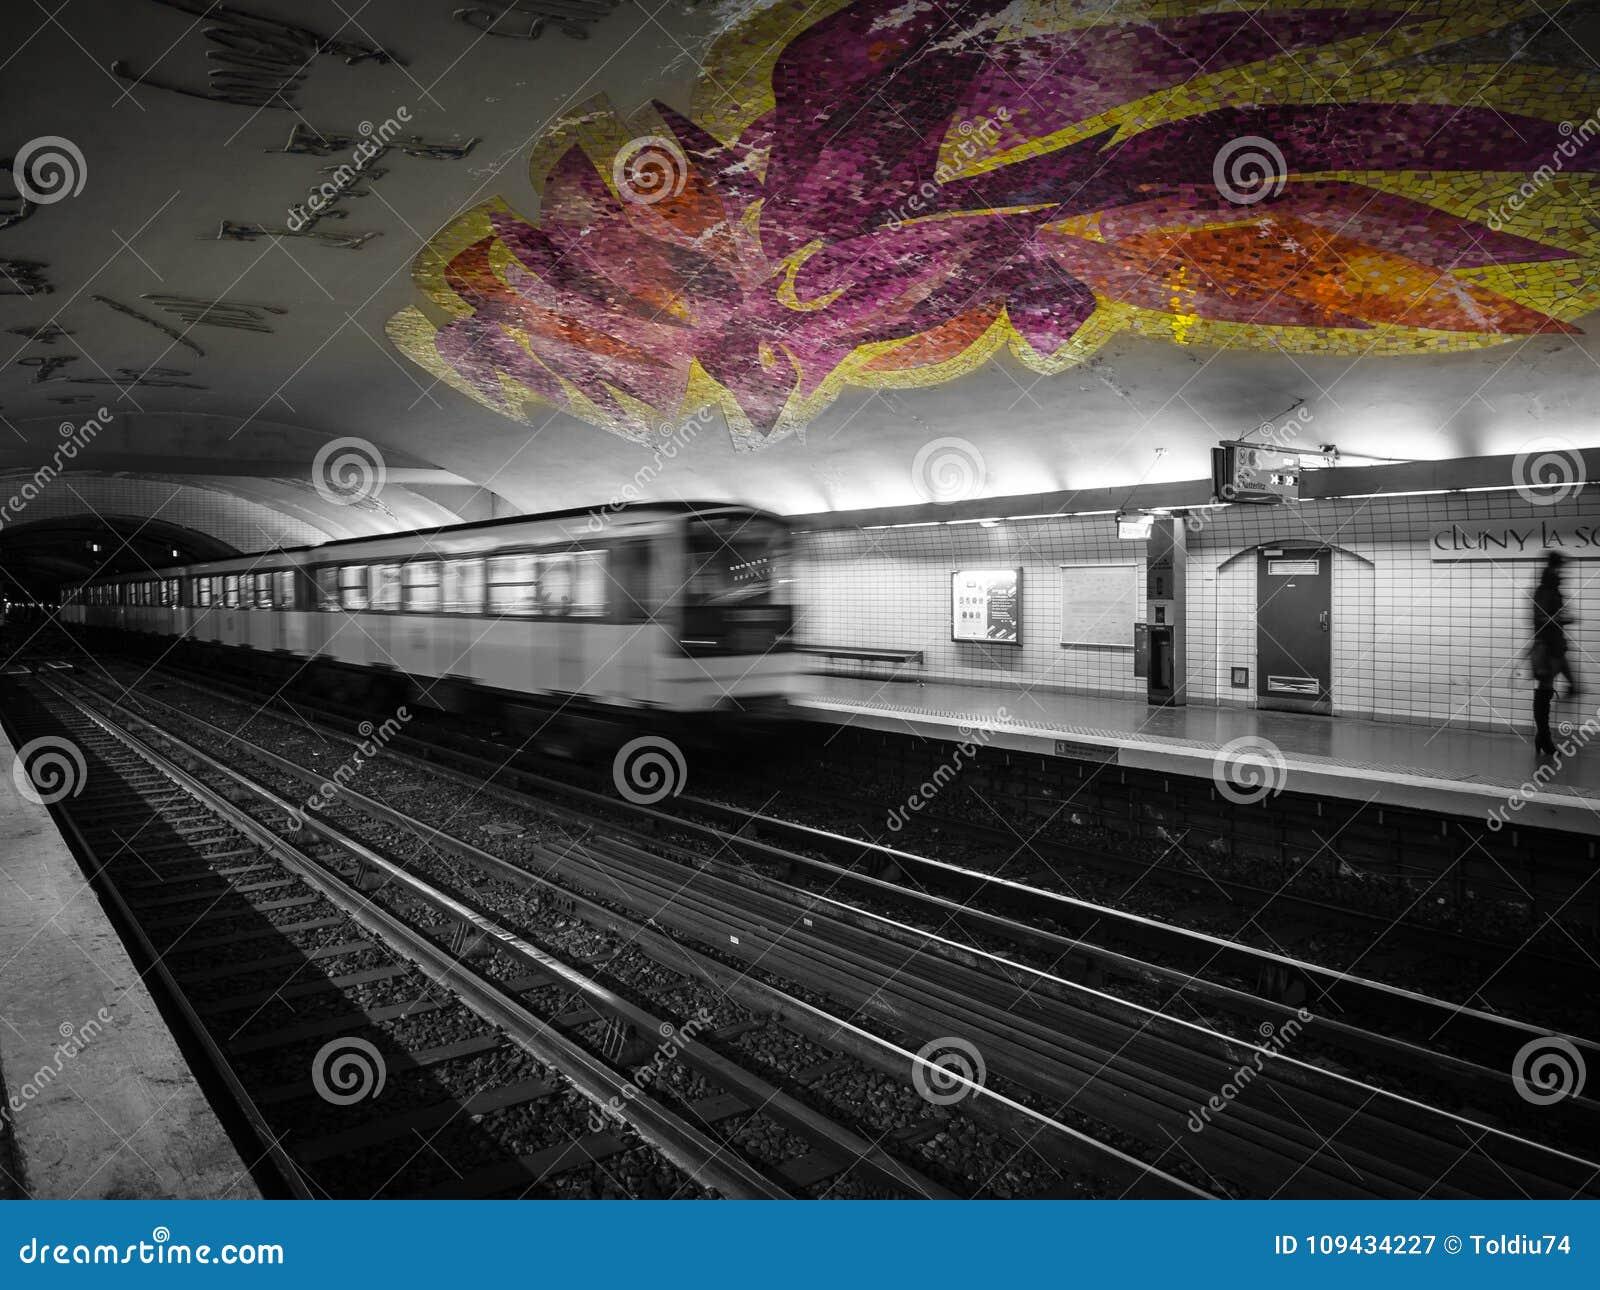 Mosaic ceiling in gaudy colors in the Paris metro.